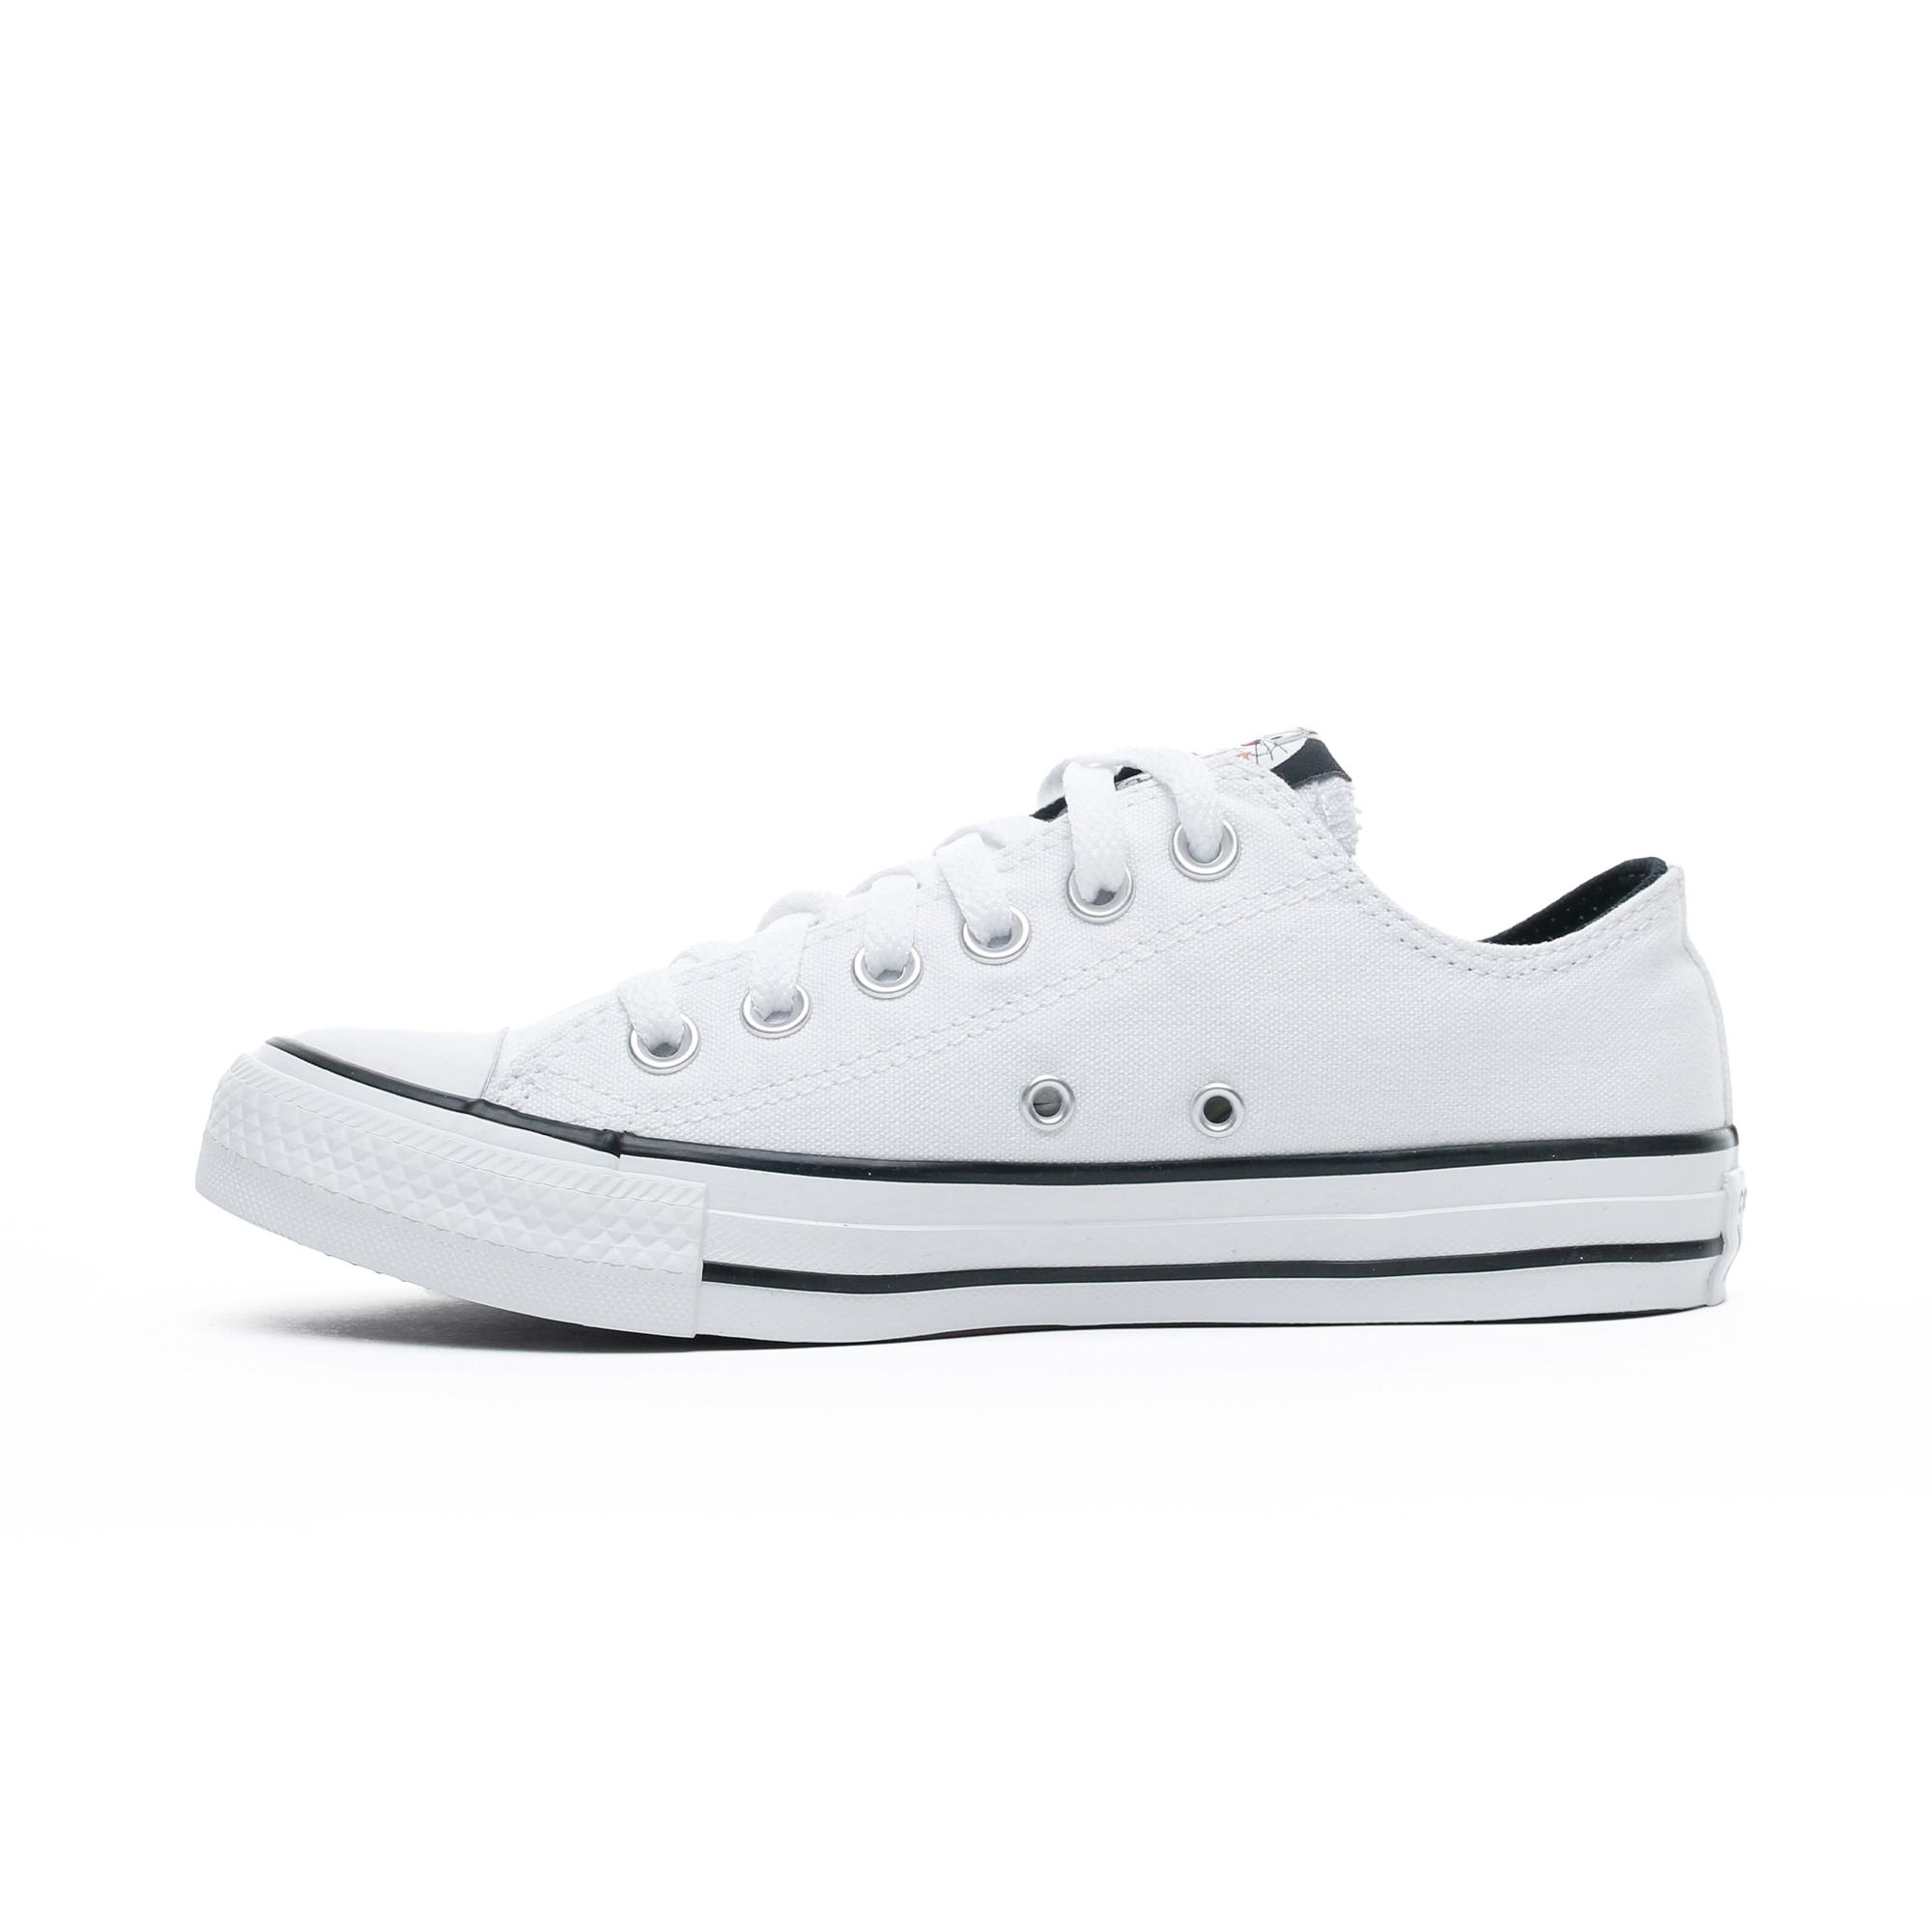 Converse x Bugs Bunny Chuck Taylor All Star Kadın Beyaz Sneaker